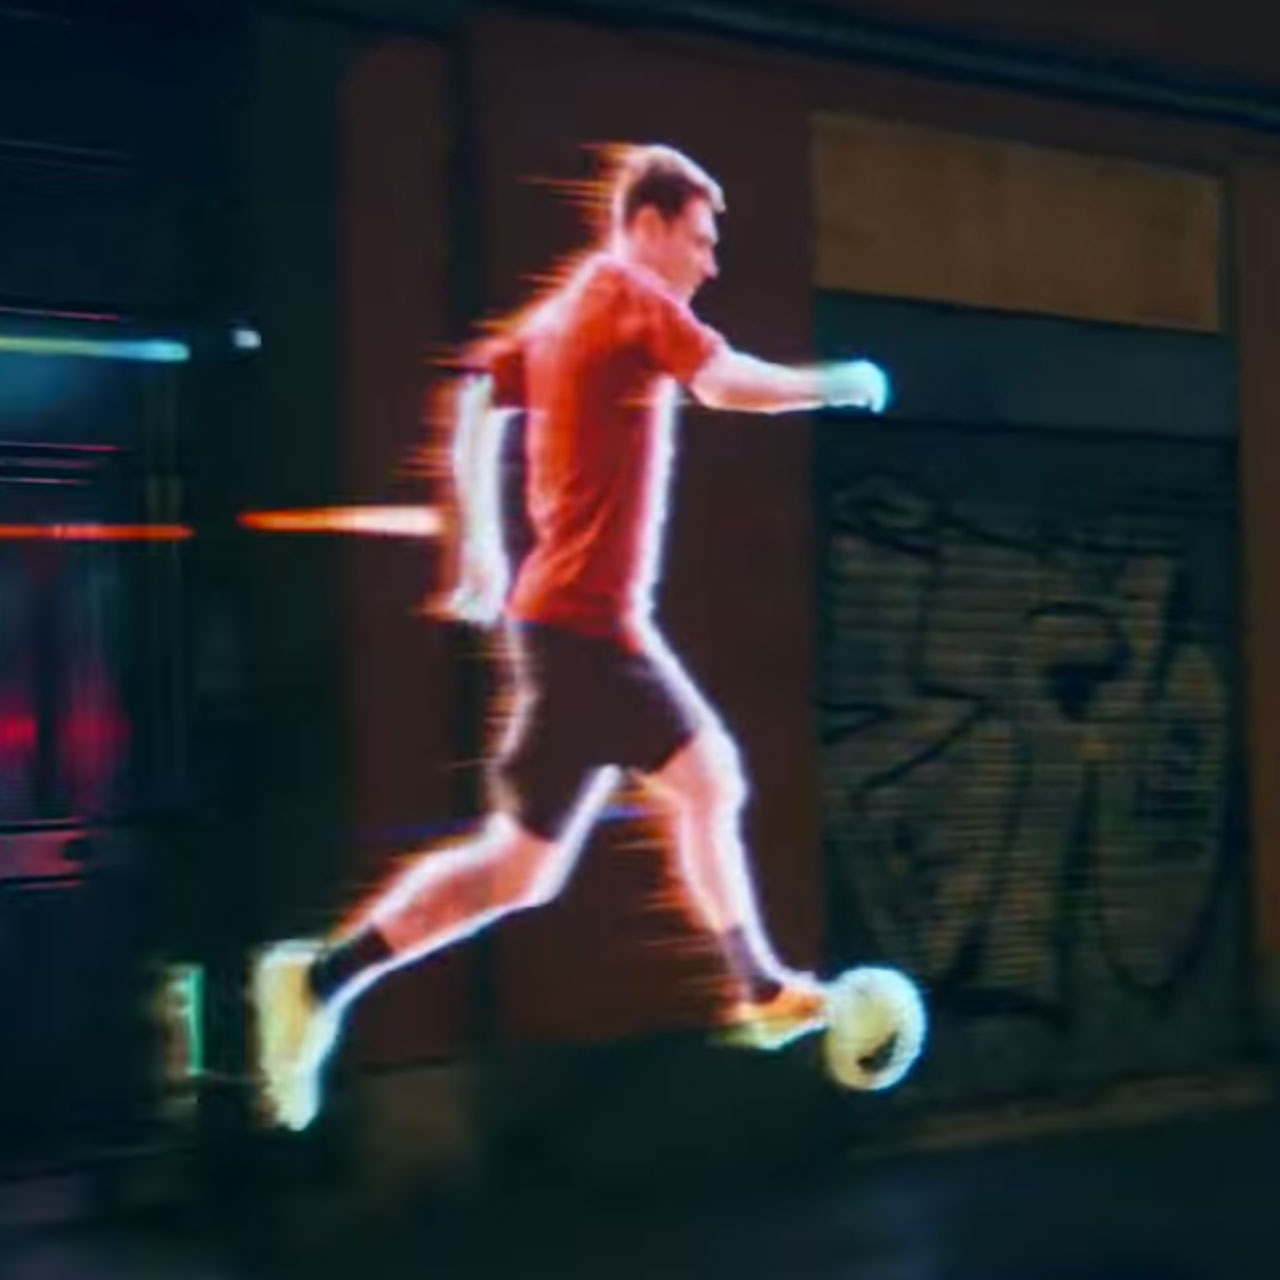 Lionel Messi running in Barcelona in his new Adizero F50 boots